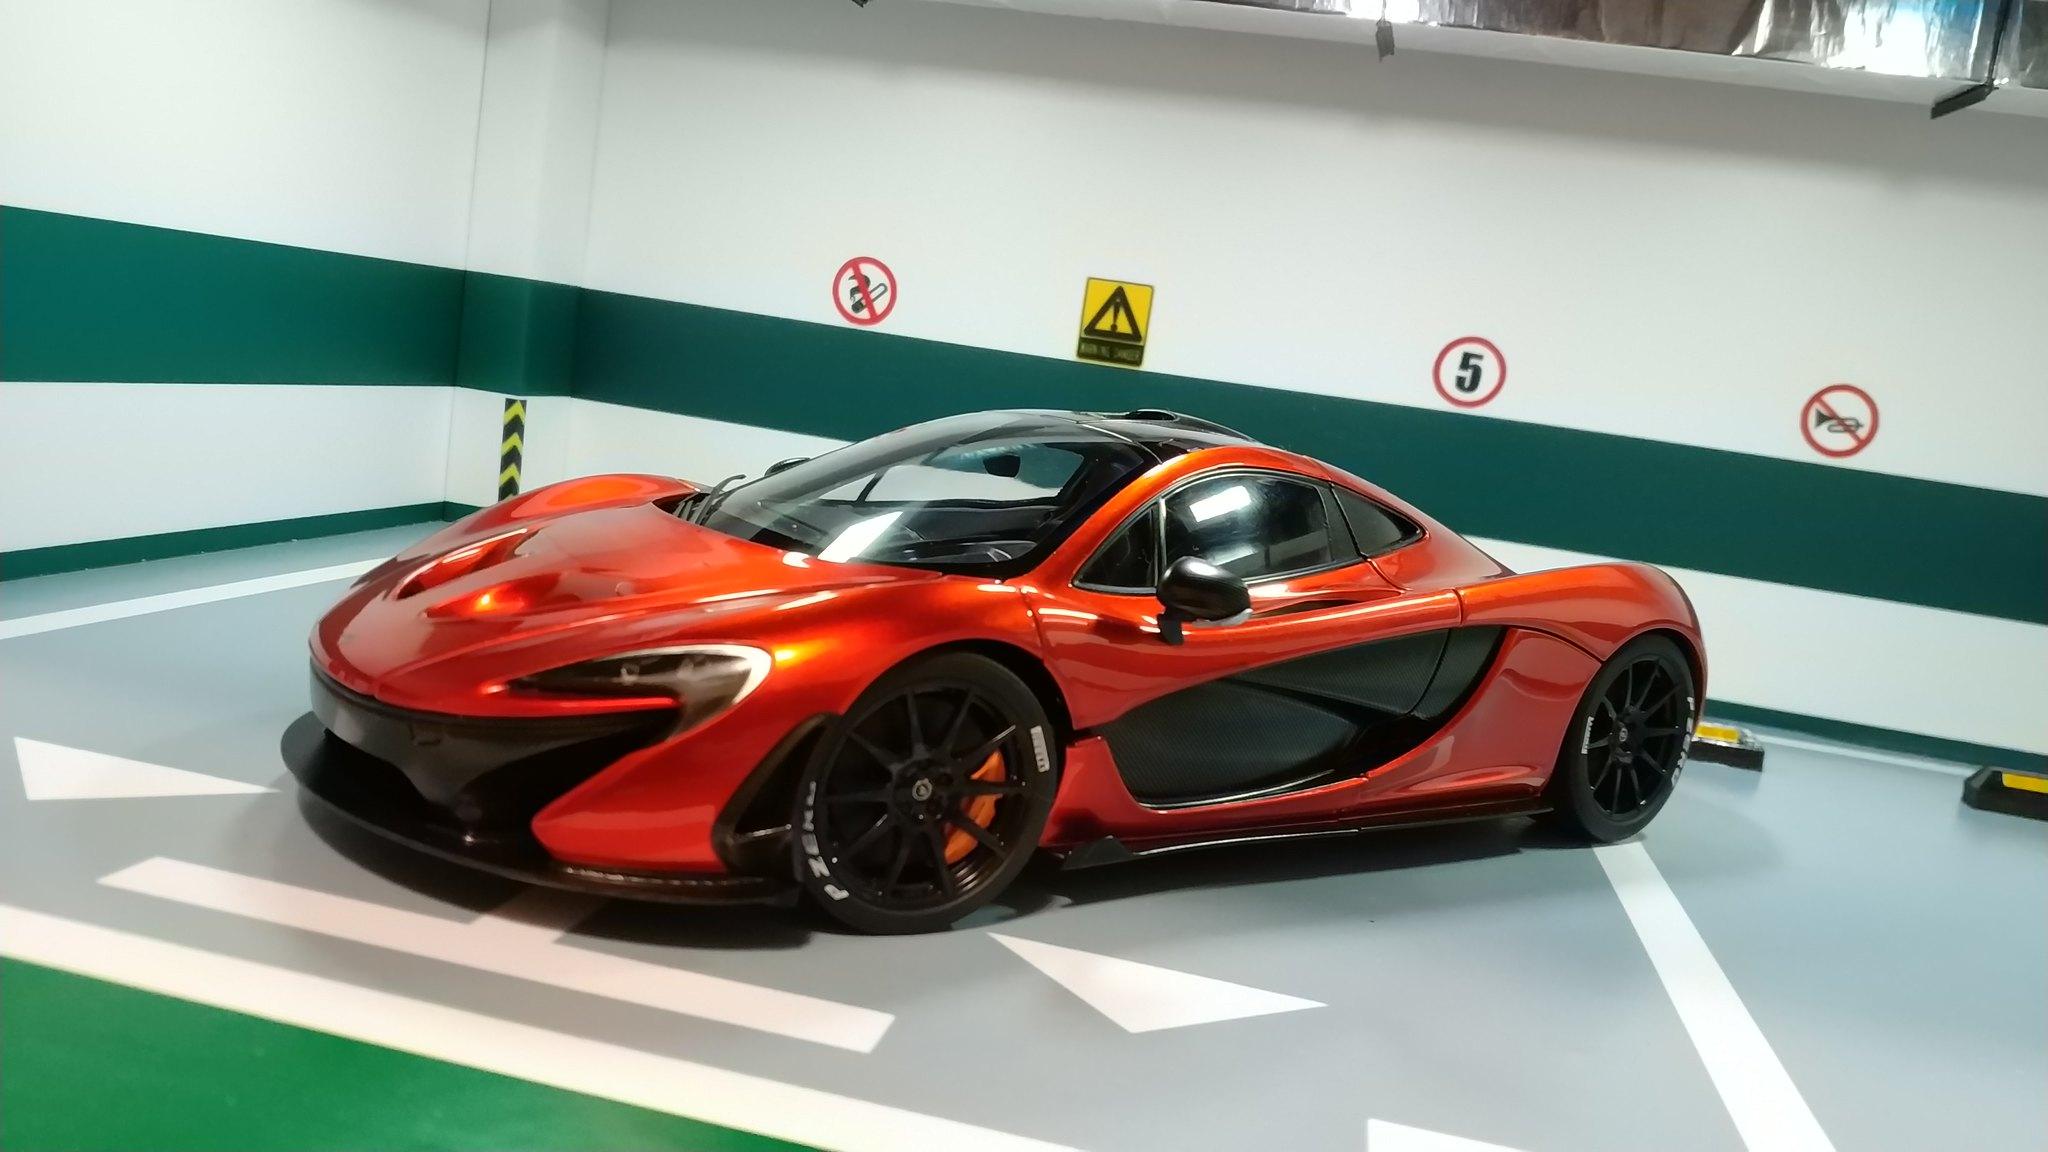 AUTOart McLaren P1 Volcano Orange 2nd release McLaren